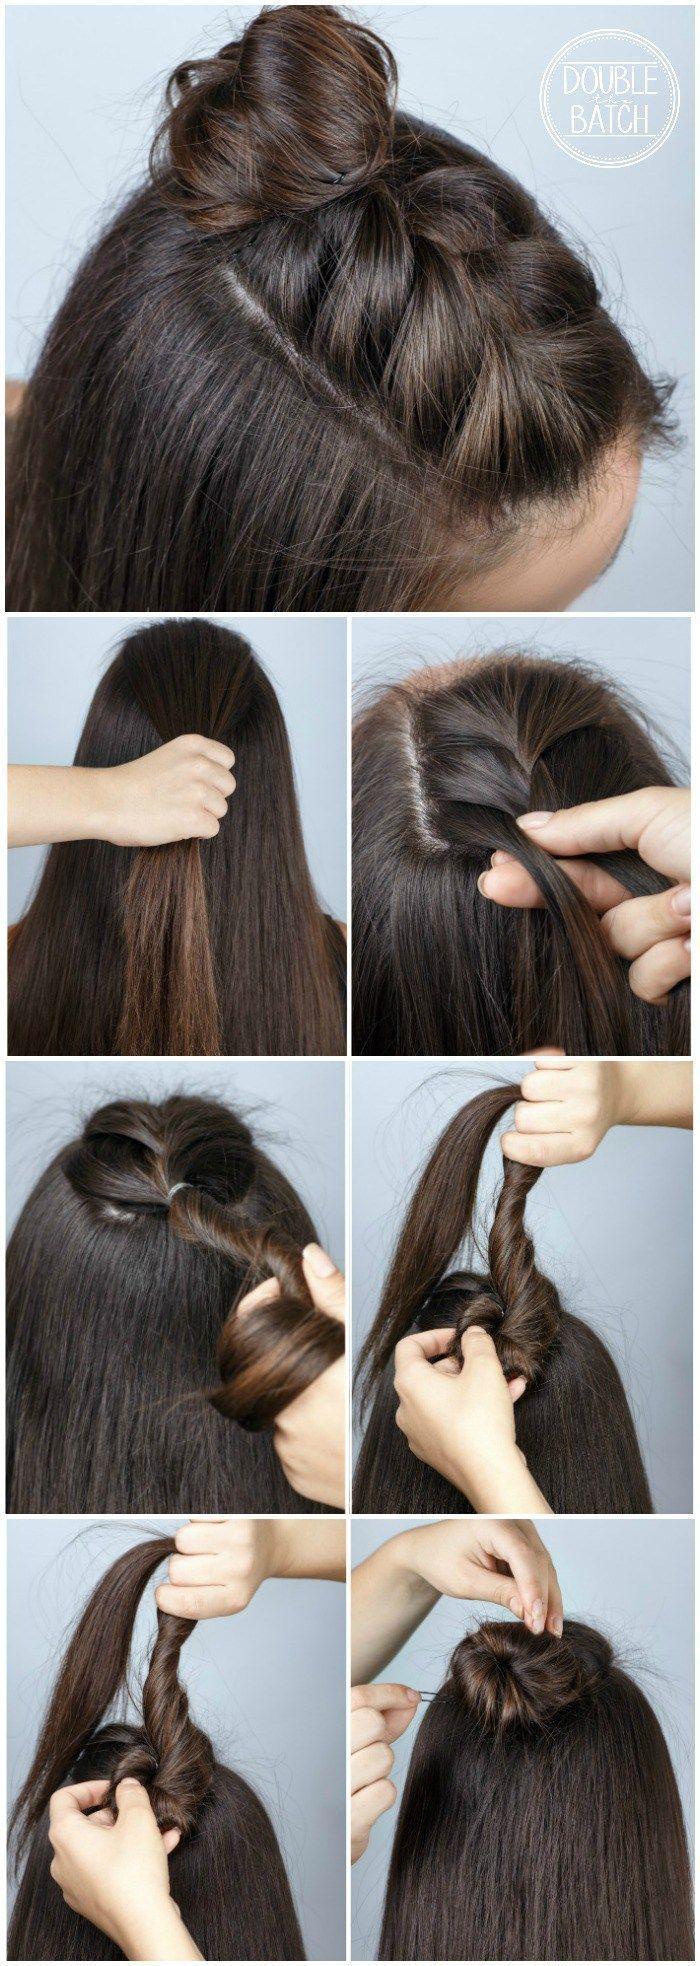 Easy Half Braid Hairstyle Tutorial – Video Hairs…